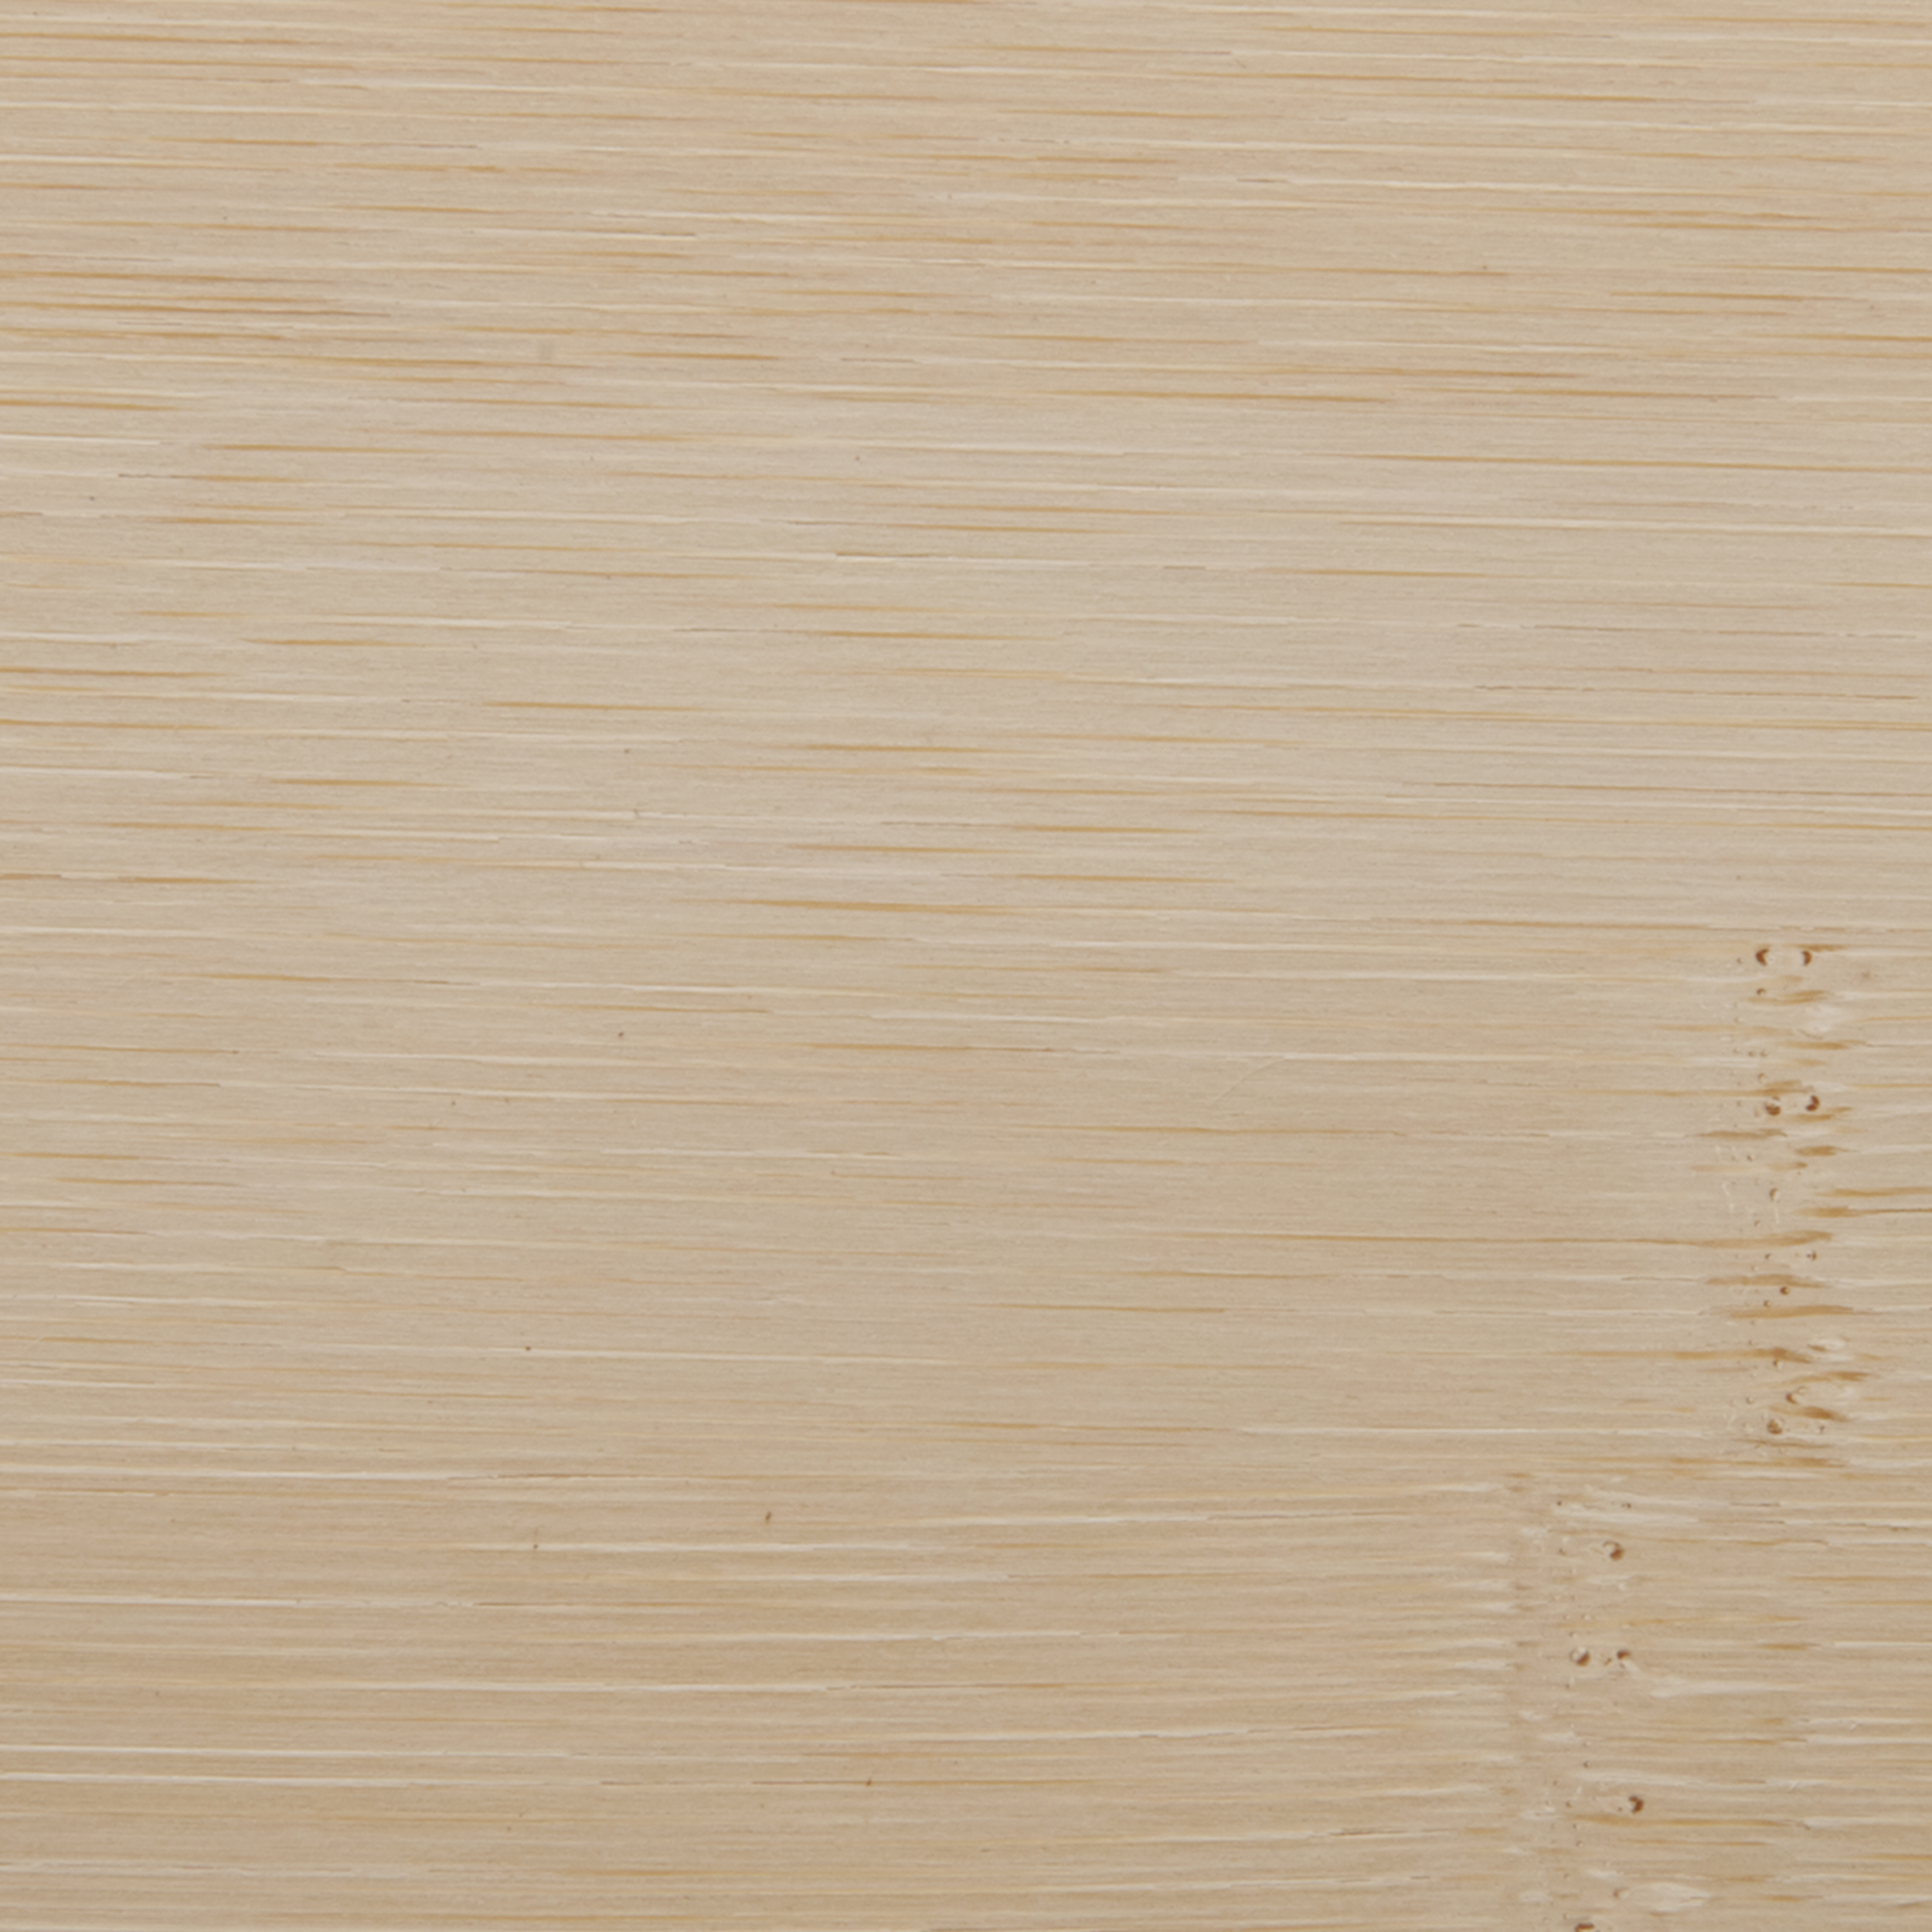 Bamboo, White 4'X8' Veneer Sheet, 3M PSA Backed